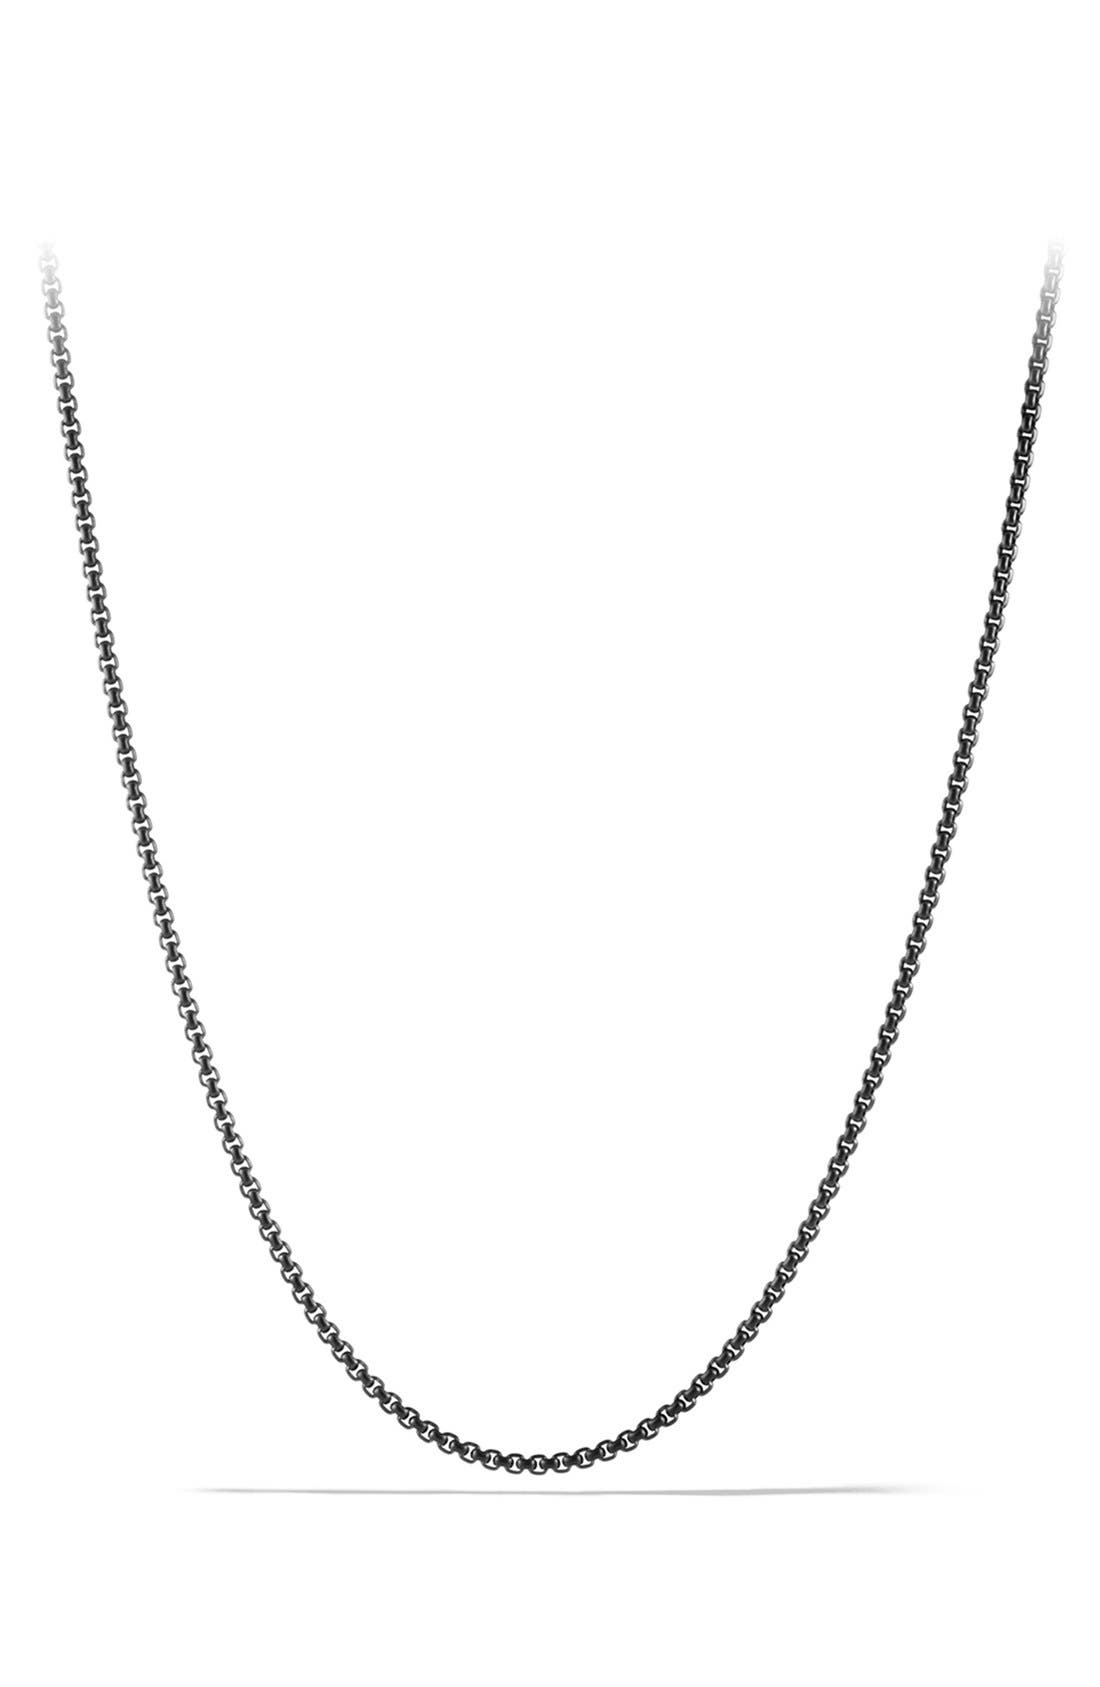 DAVID YURMAN Chain Small Box Chain Necklace